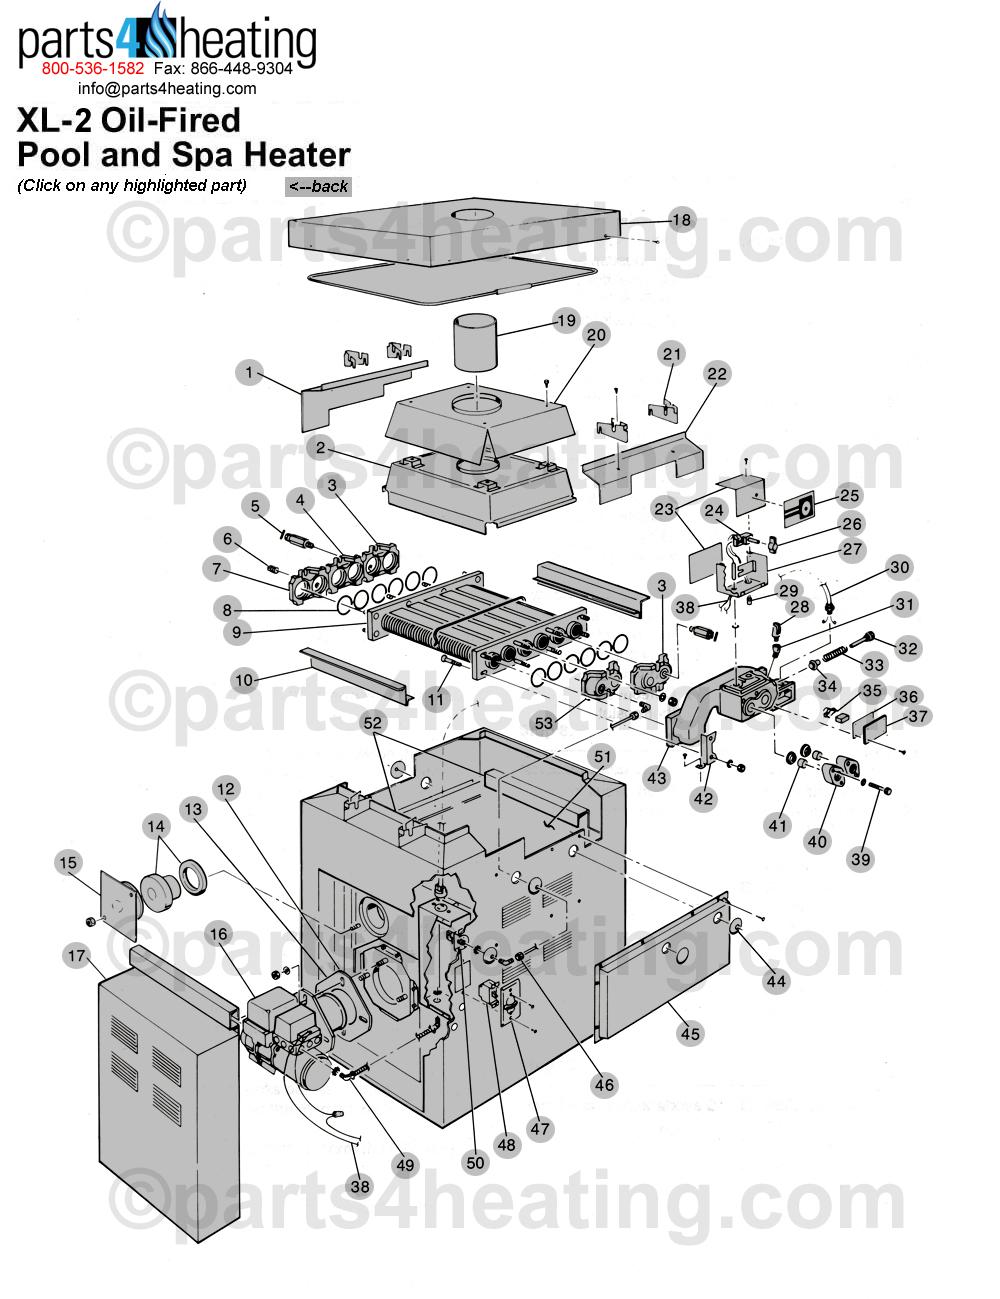 pdf noma oil heater manual